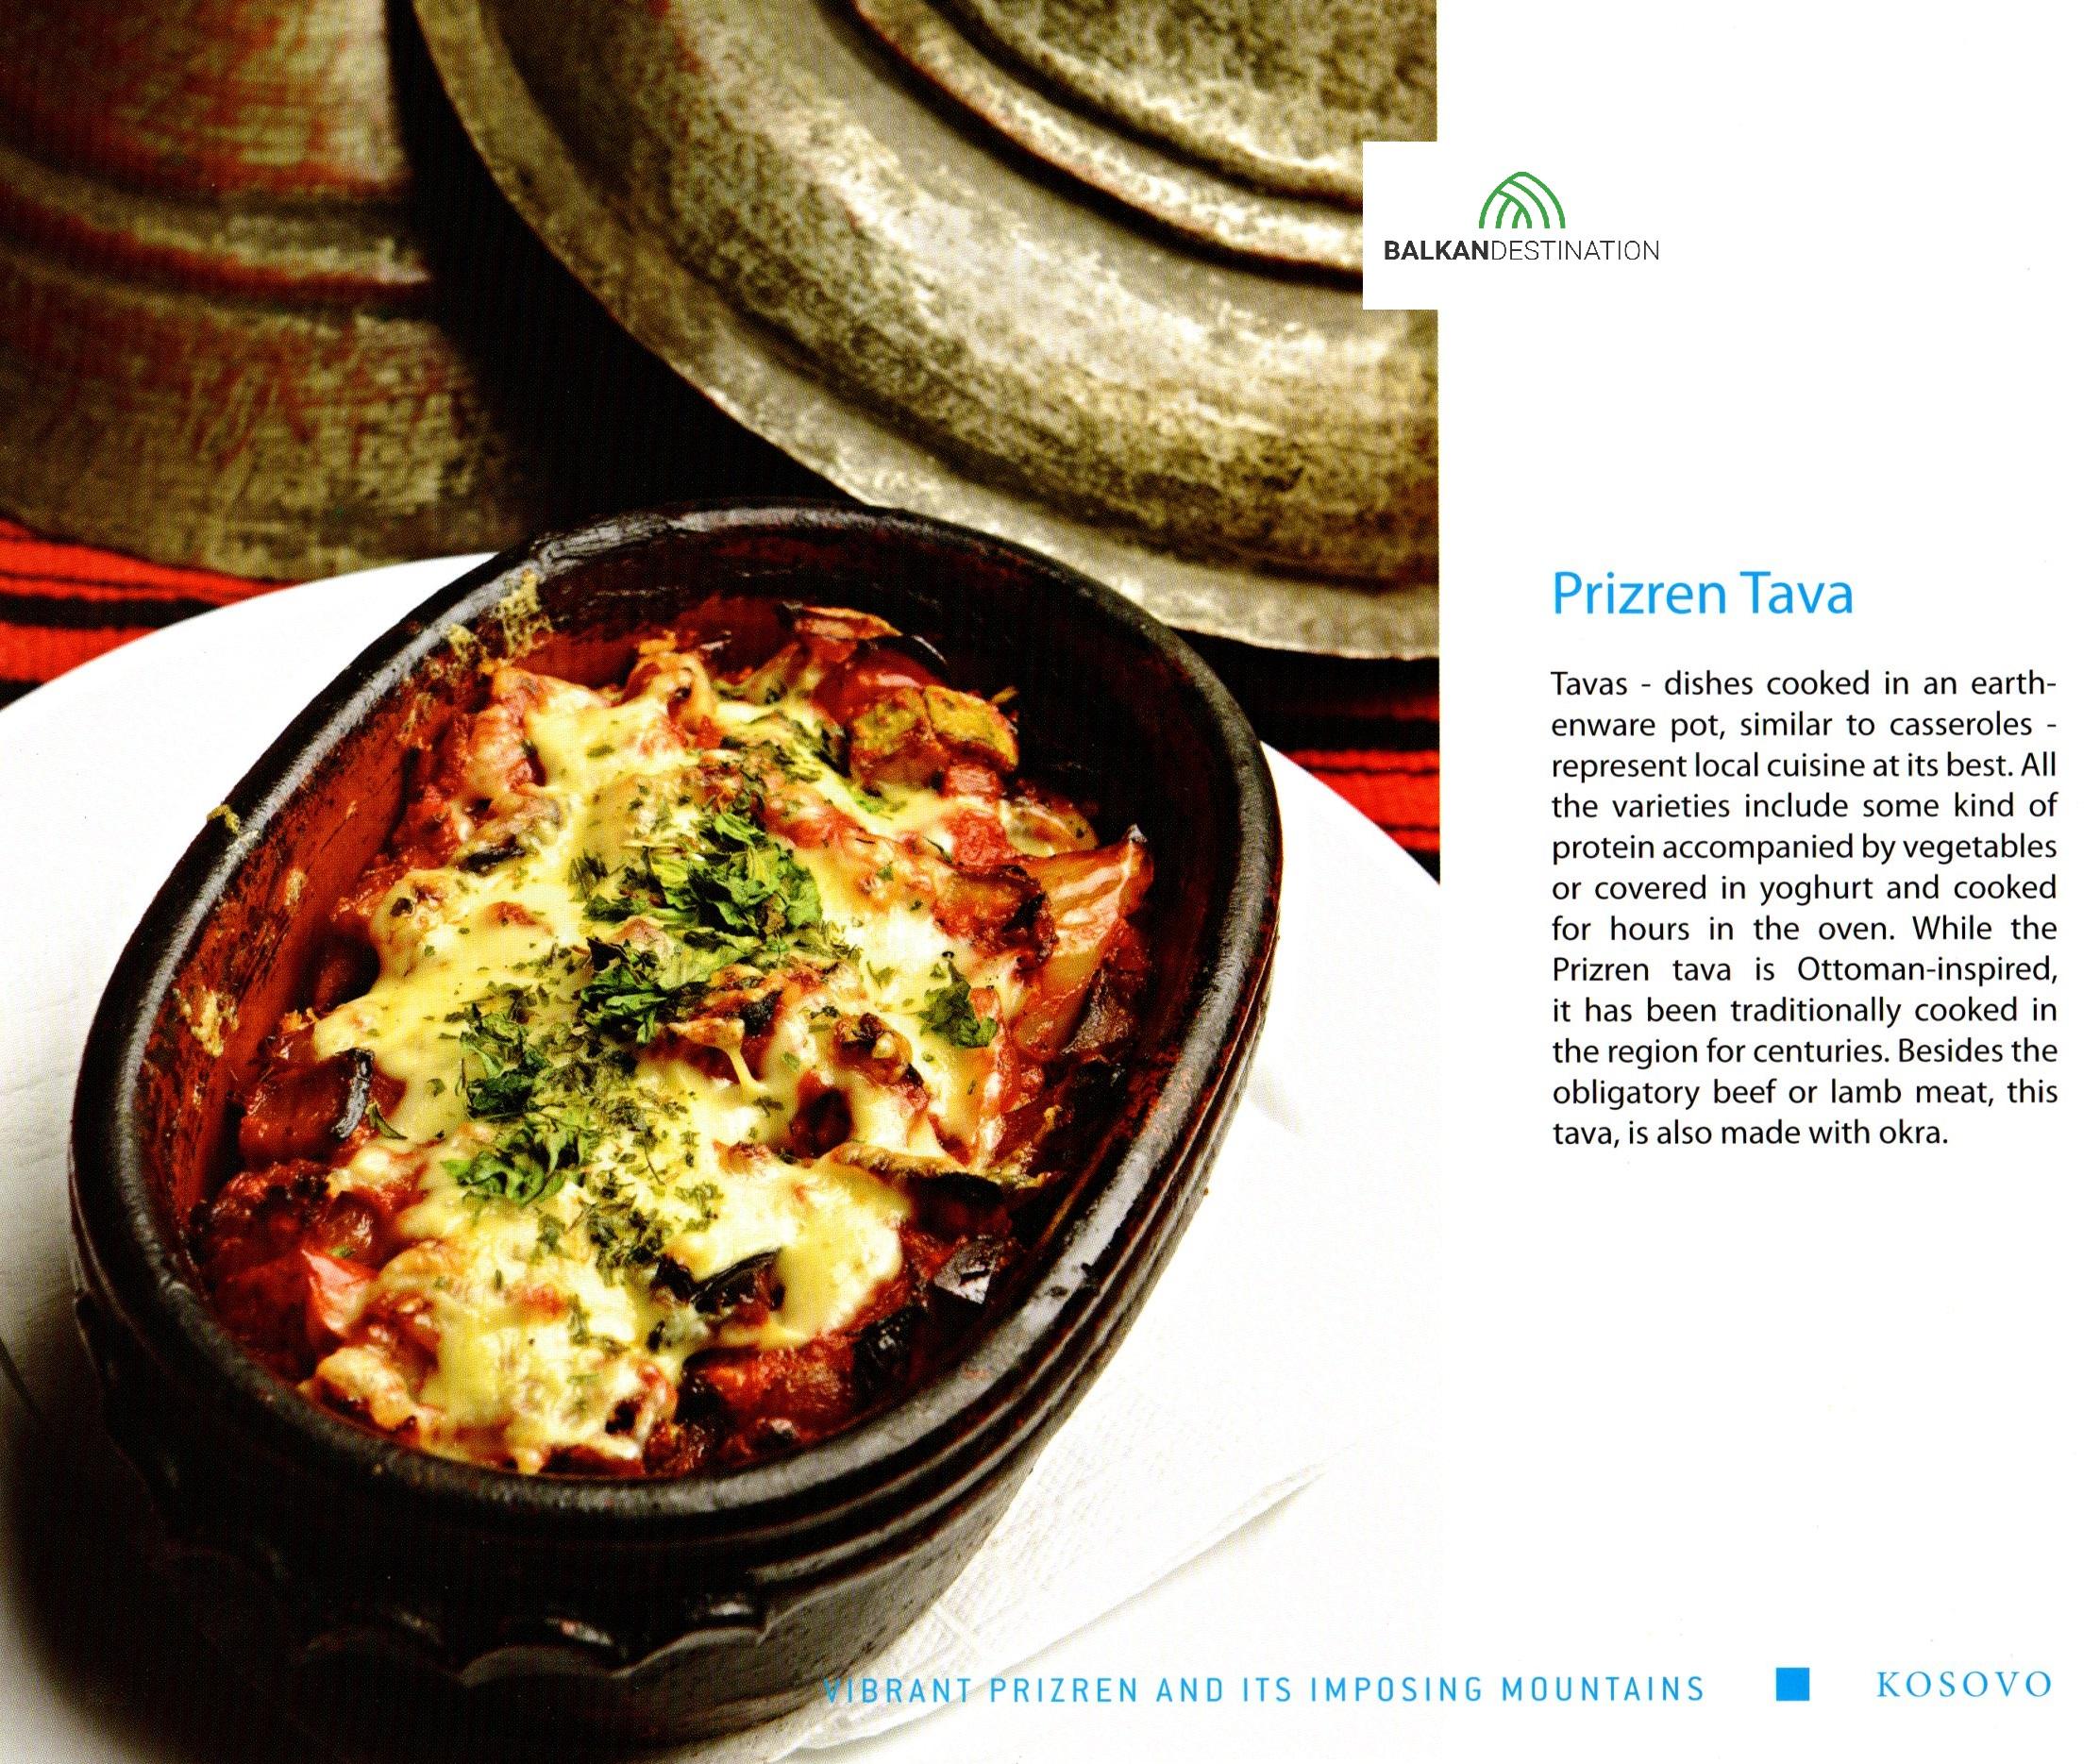 traditionalfood Prizren kosovo balkandestination